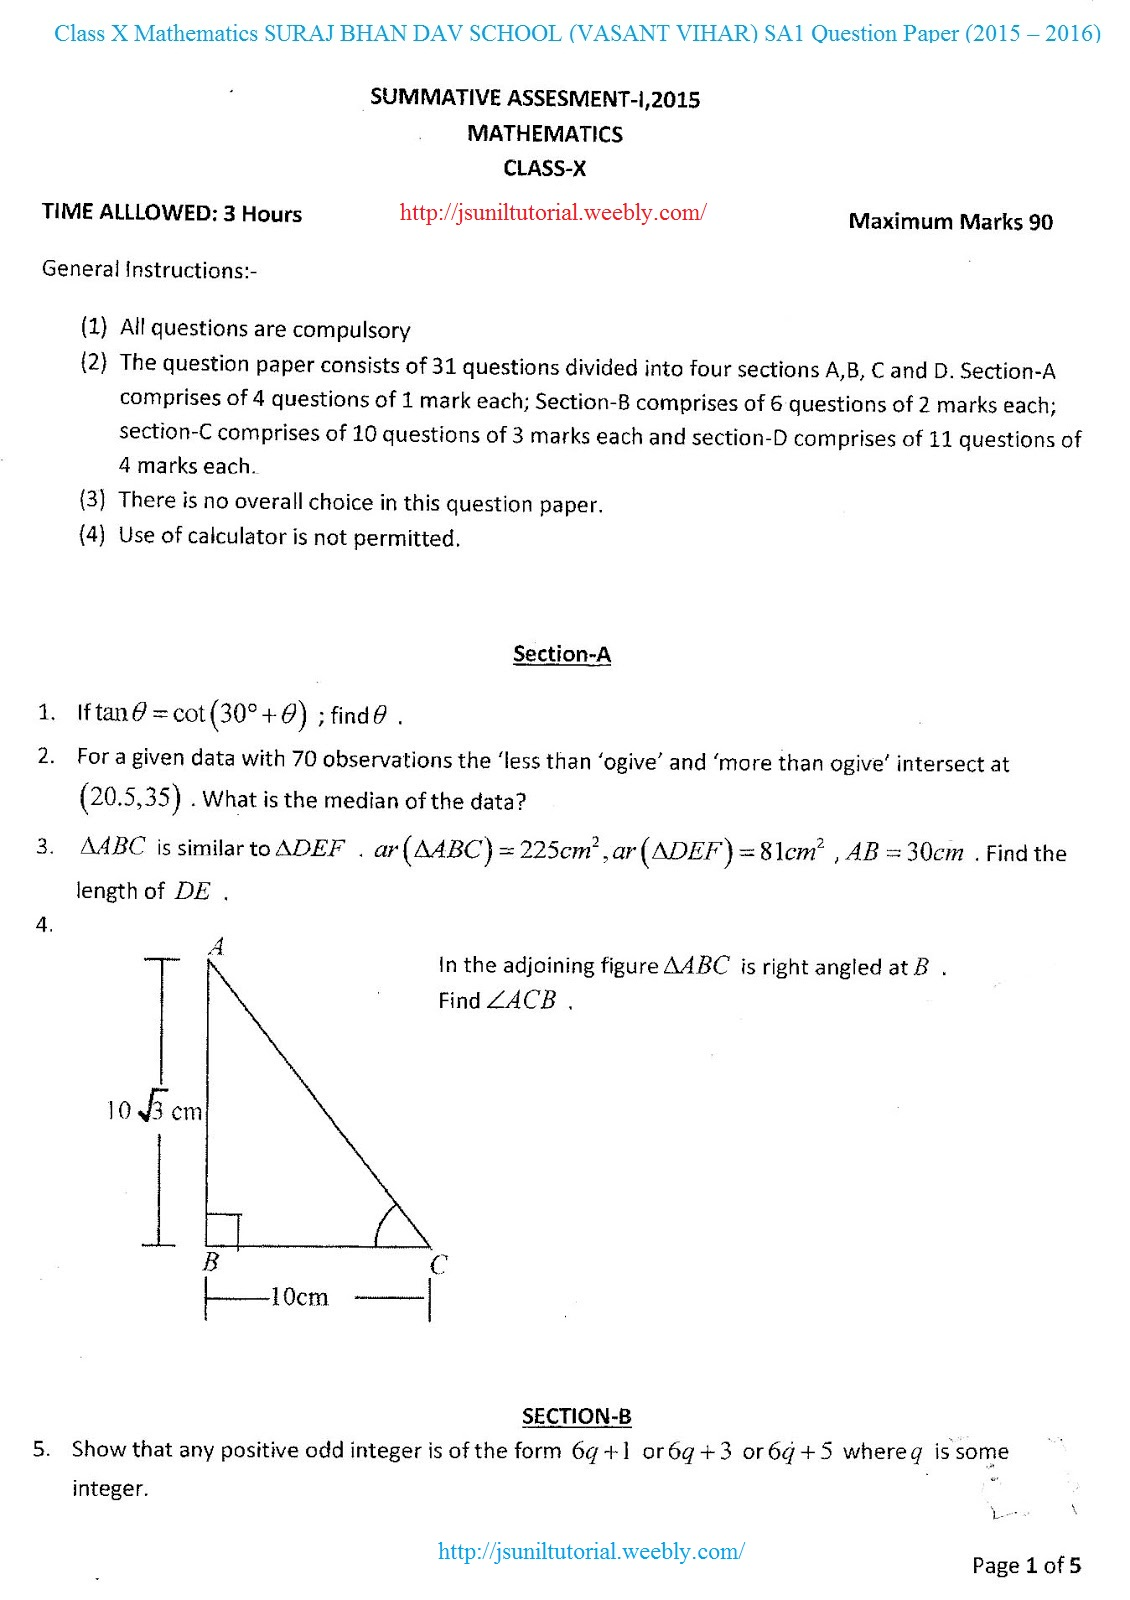 CBSE Class 10 Maths Syllabus 2018 & Tips to Attempt Paper!